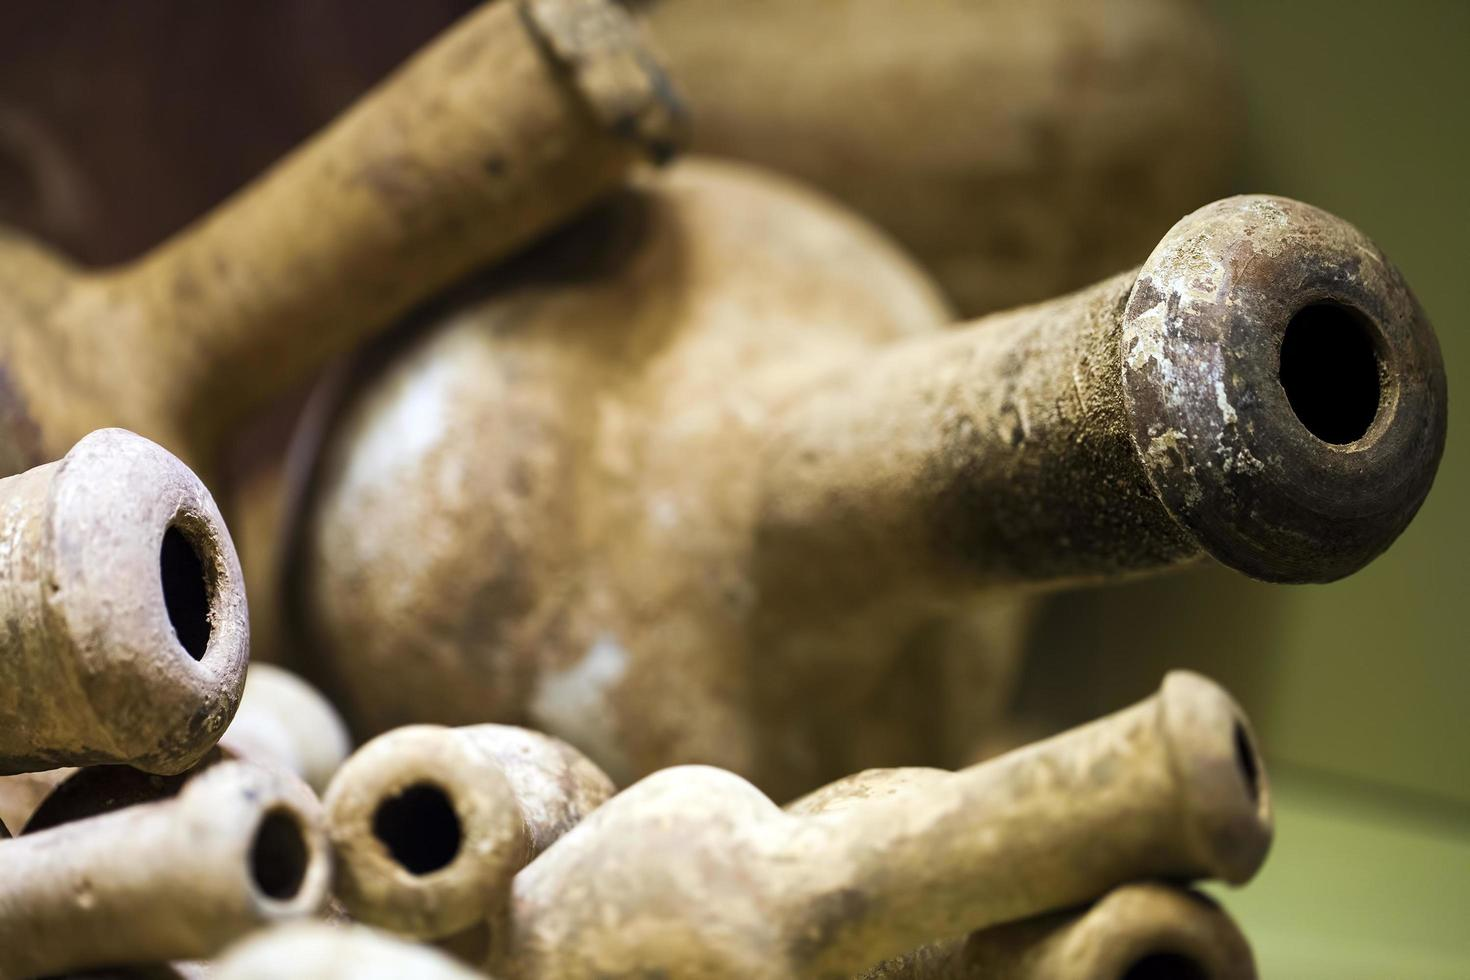 antike antike topf historische kunstobjekte foto